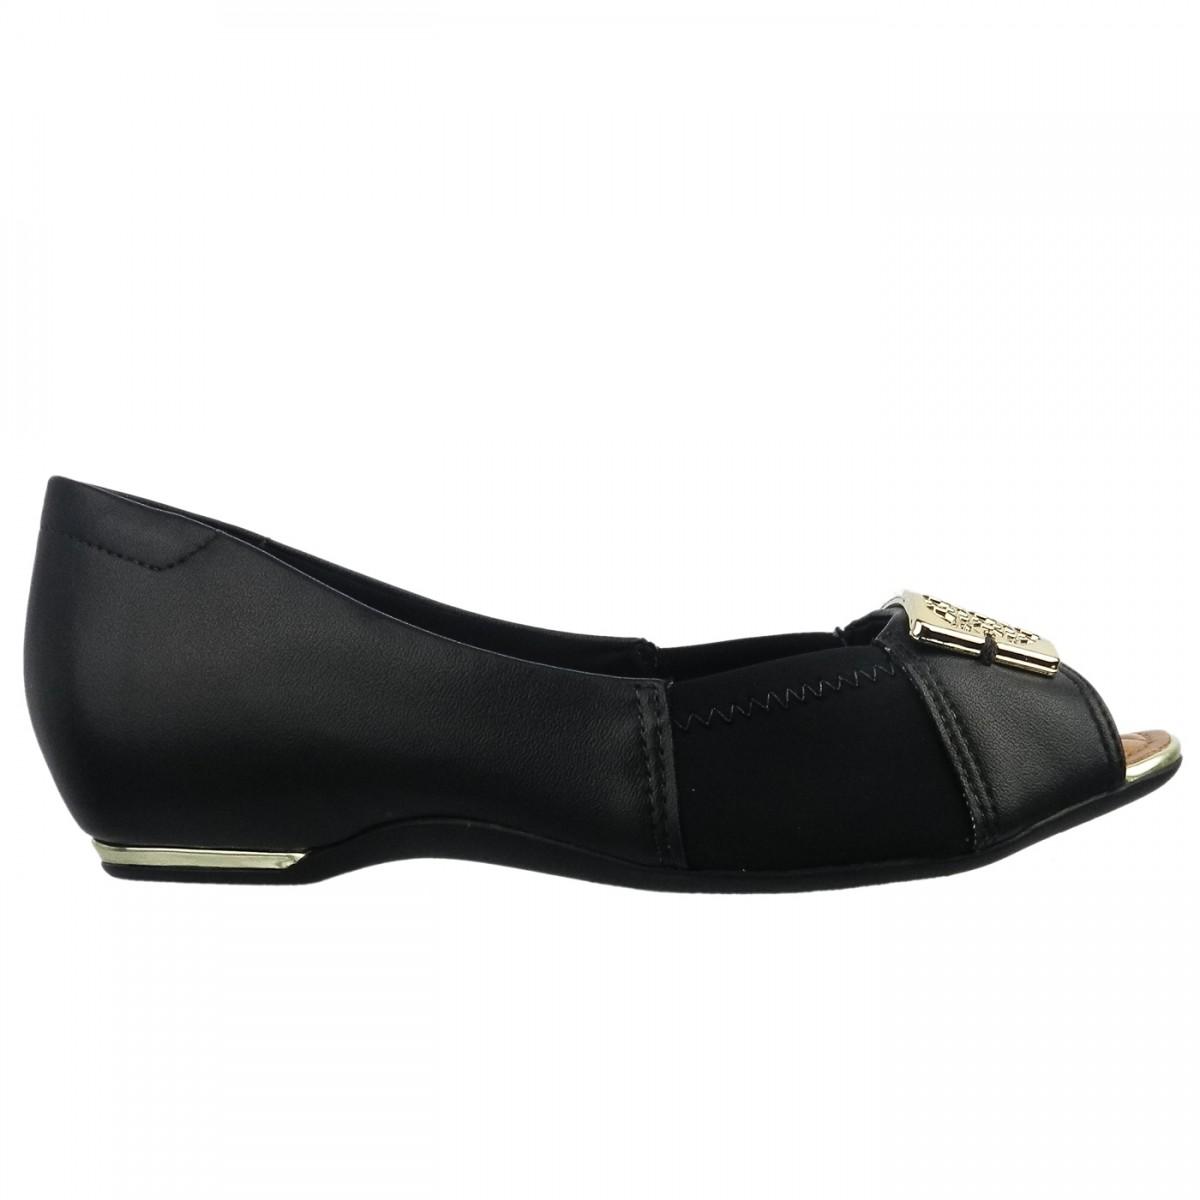 46591a278 Bizz Store - Sapatilha Peep Toe Feminina Comfortflex Neoprene